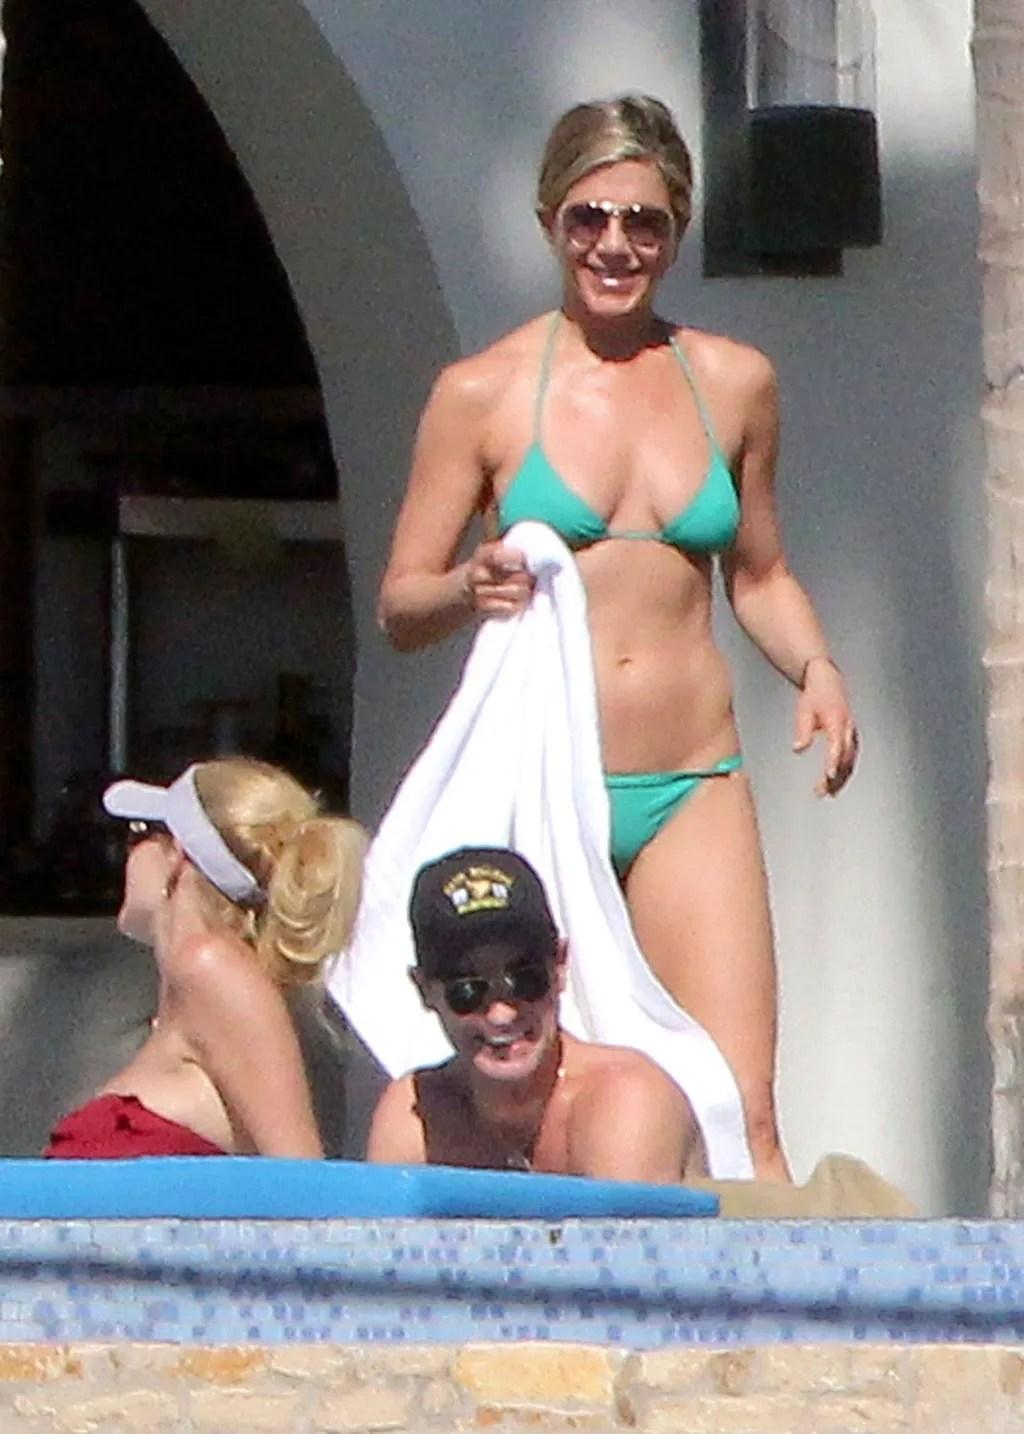 JJennifer Aniston Says Bikinis Have No Age Limit and She